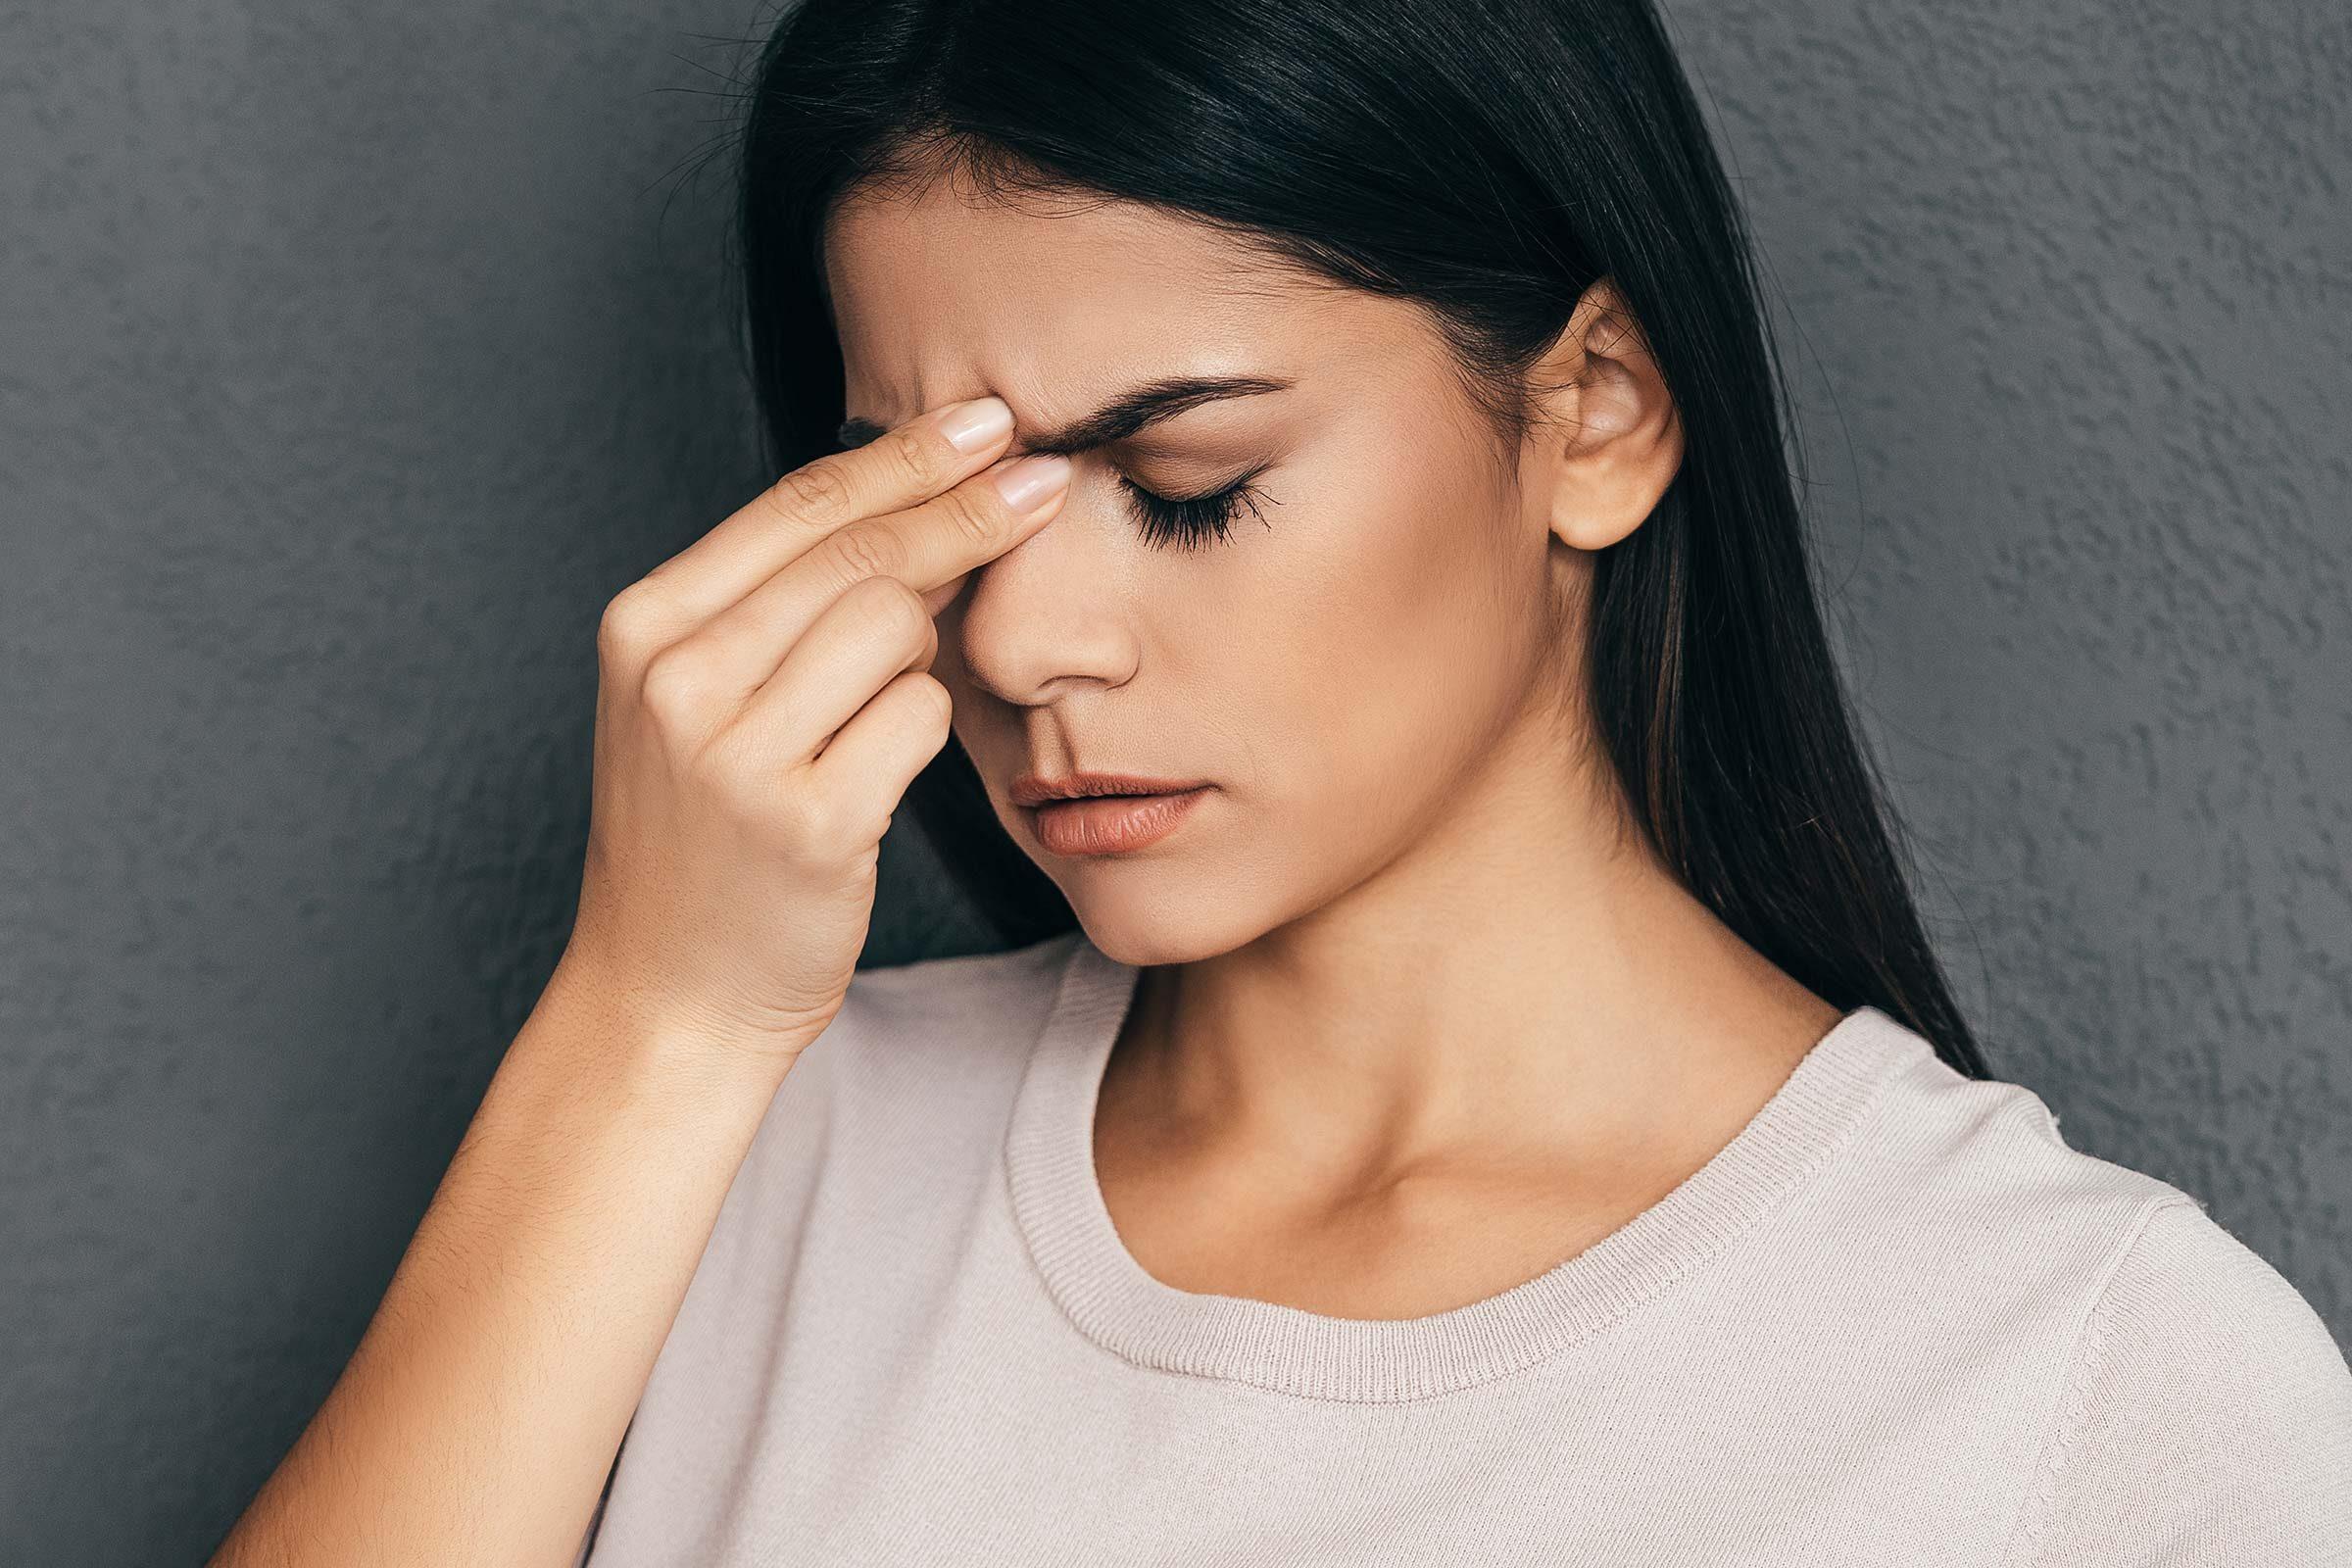 woman stress headache